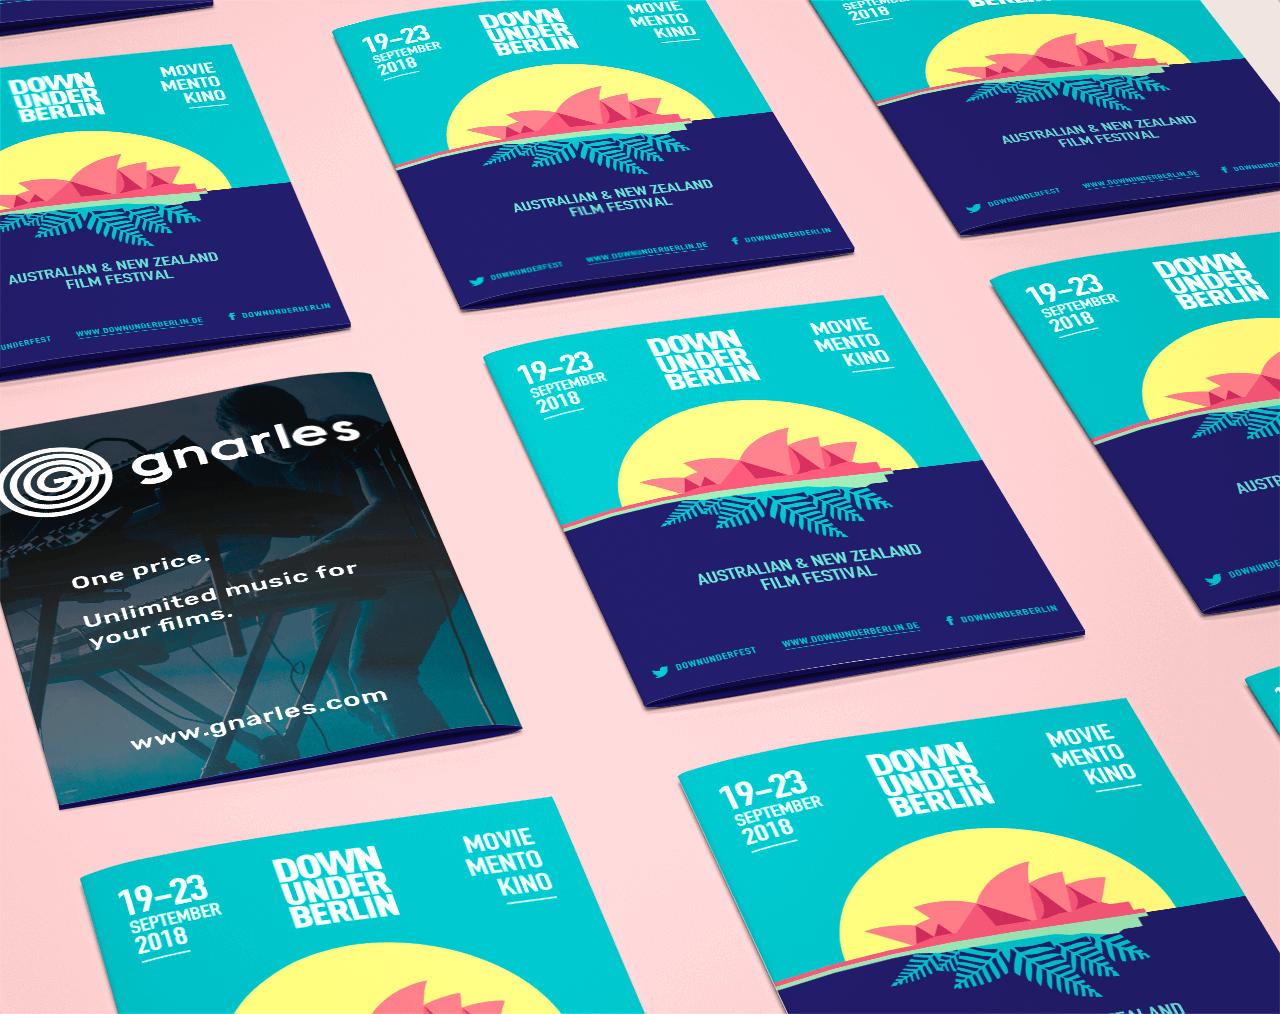 Graphic design for the Down Under Berlin film festival